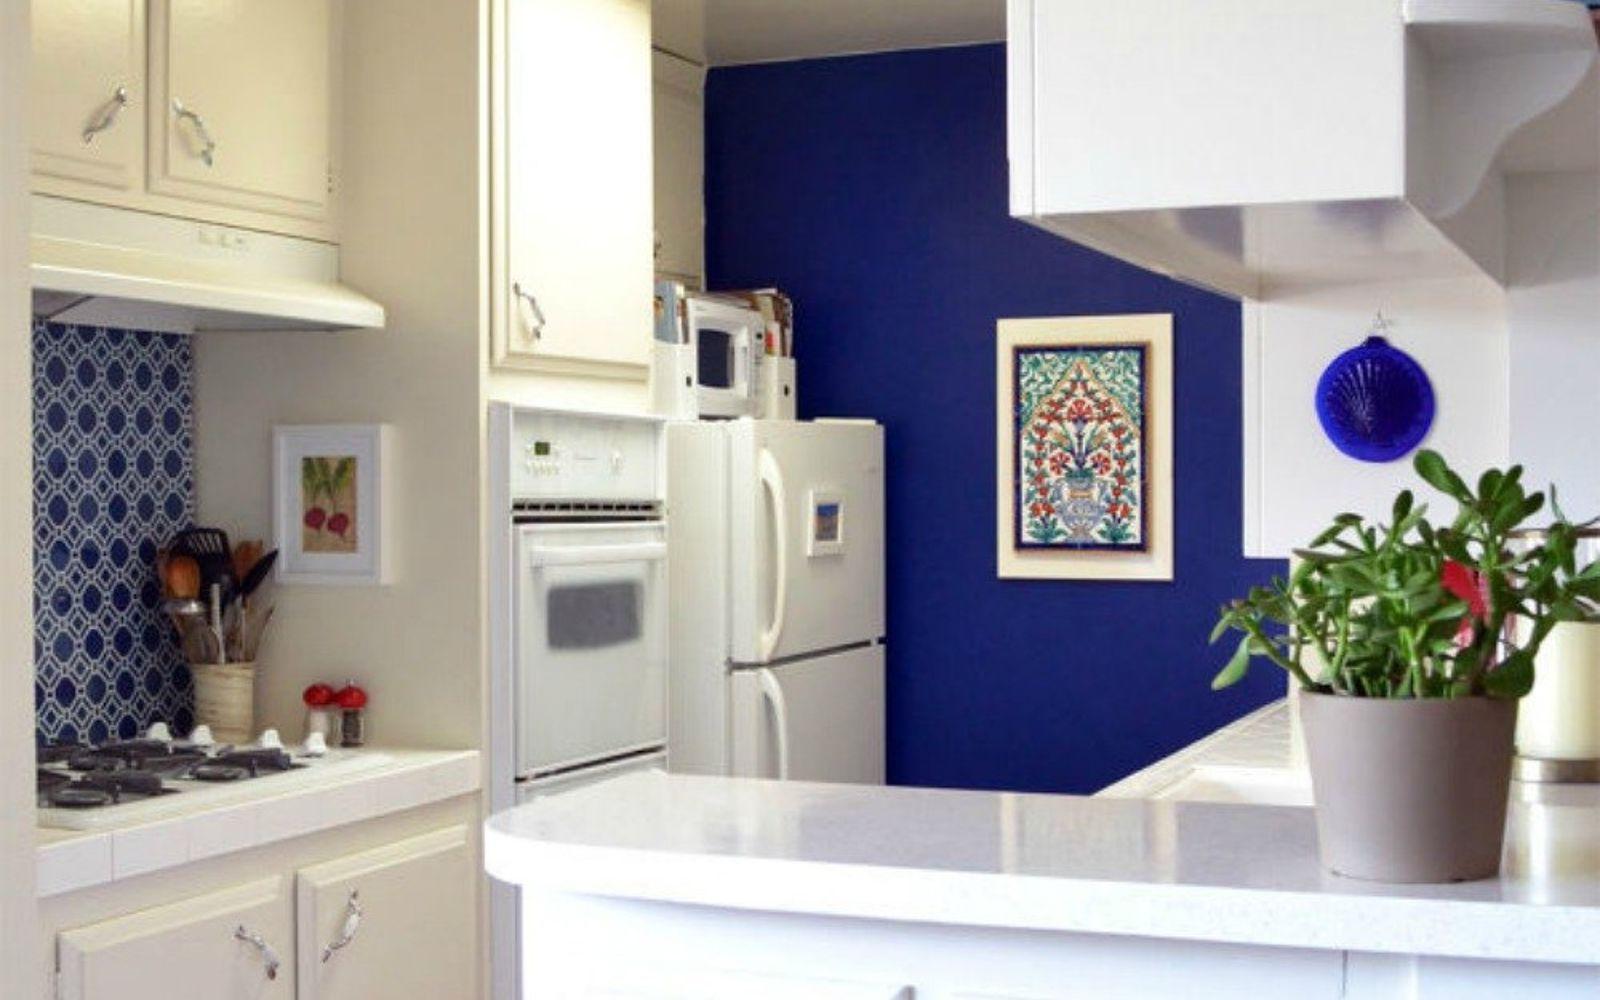 11 Temporary Kitchen Updates That Look Amazing